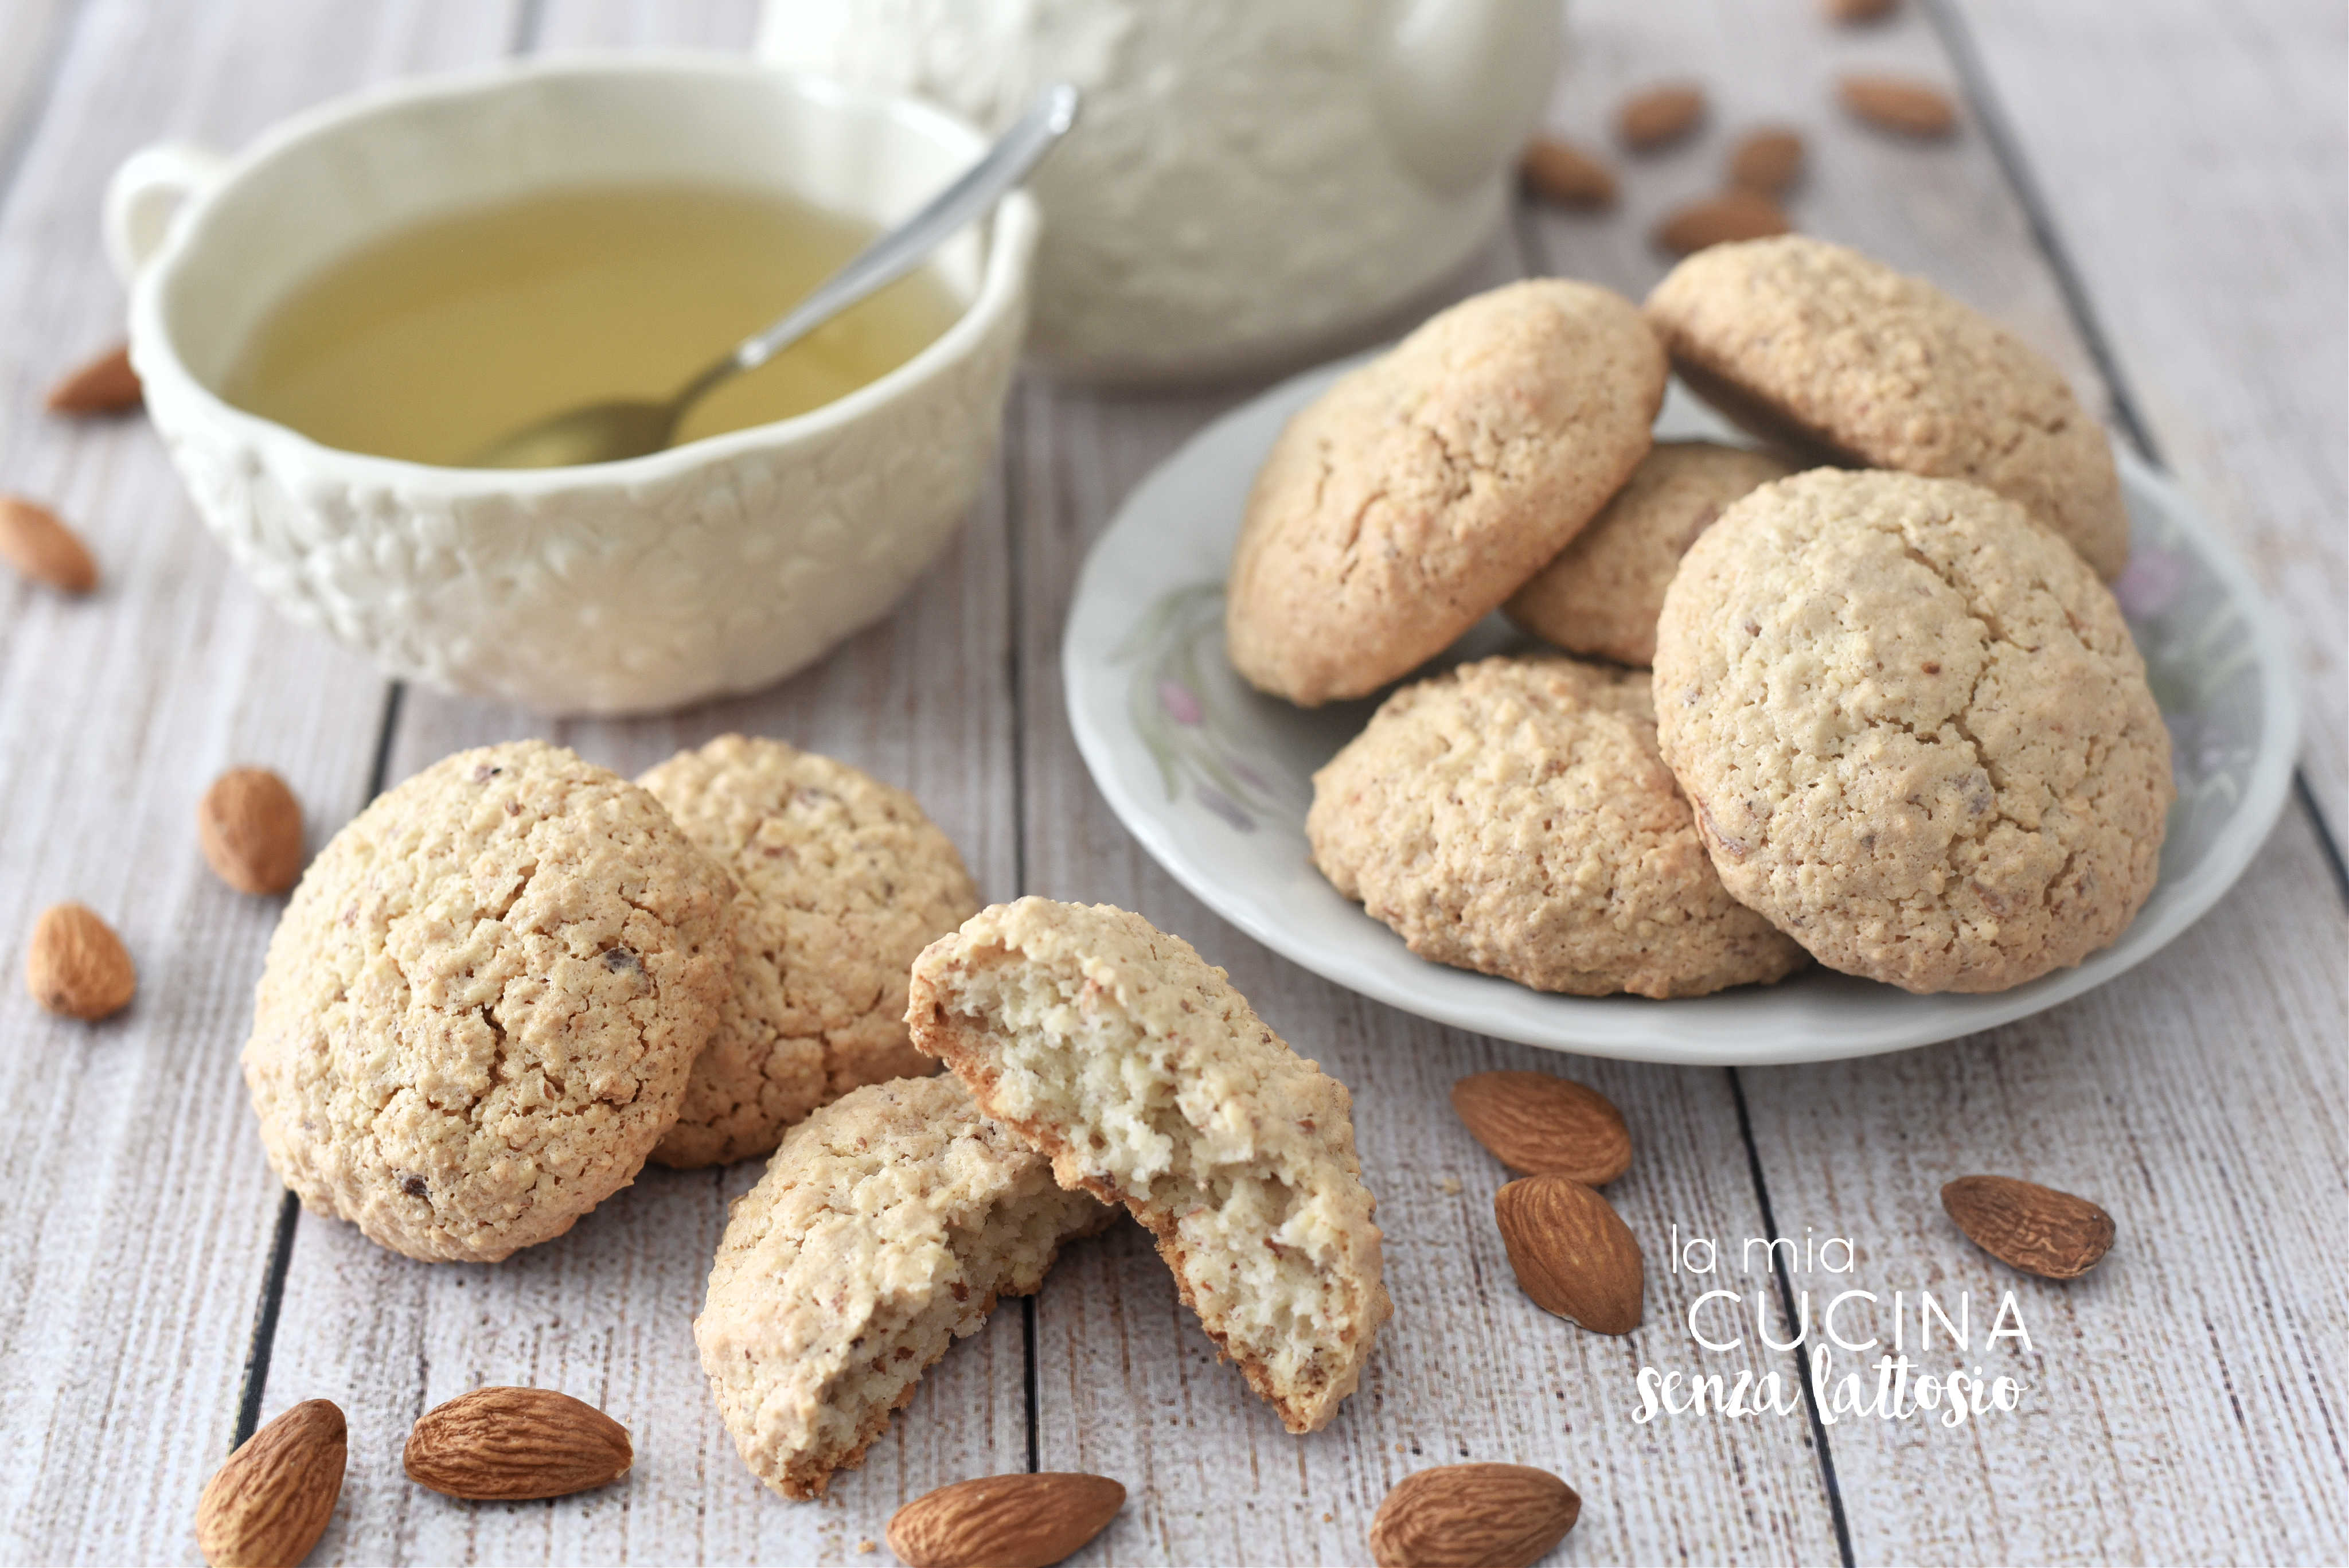 biscotti alle mandorle senza lattosio